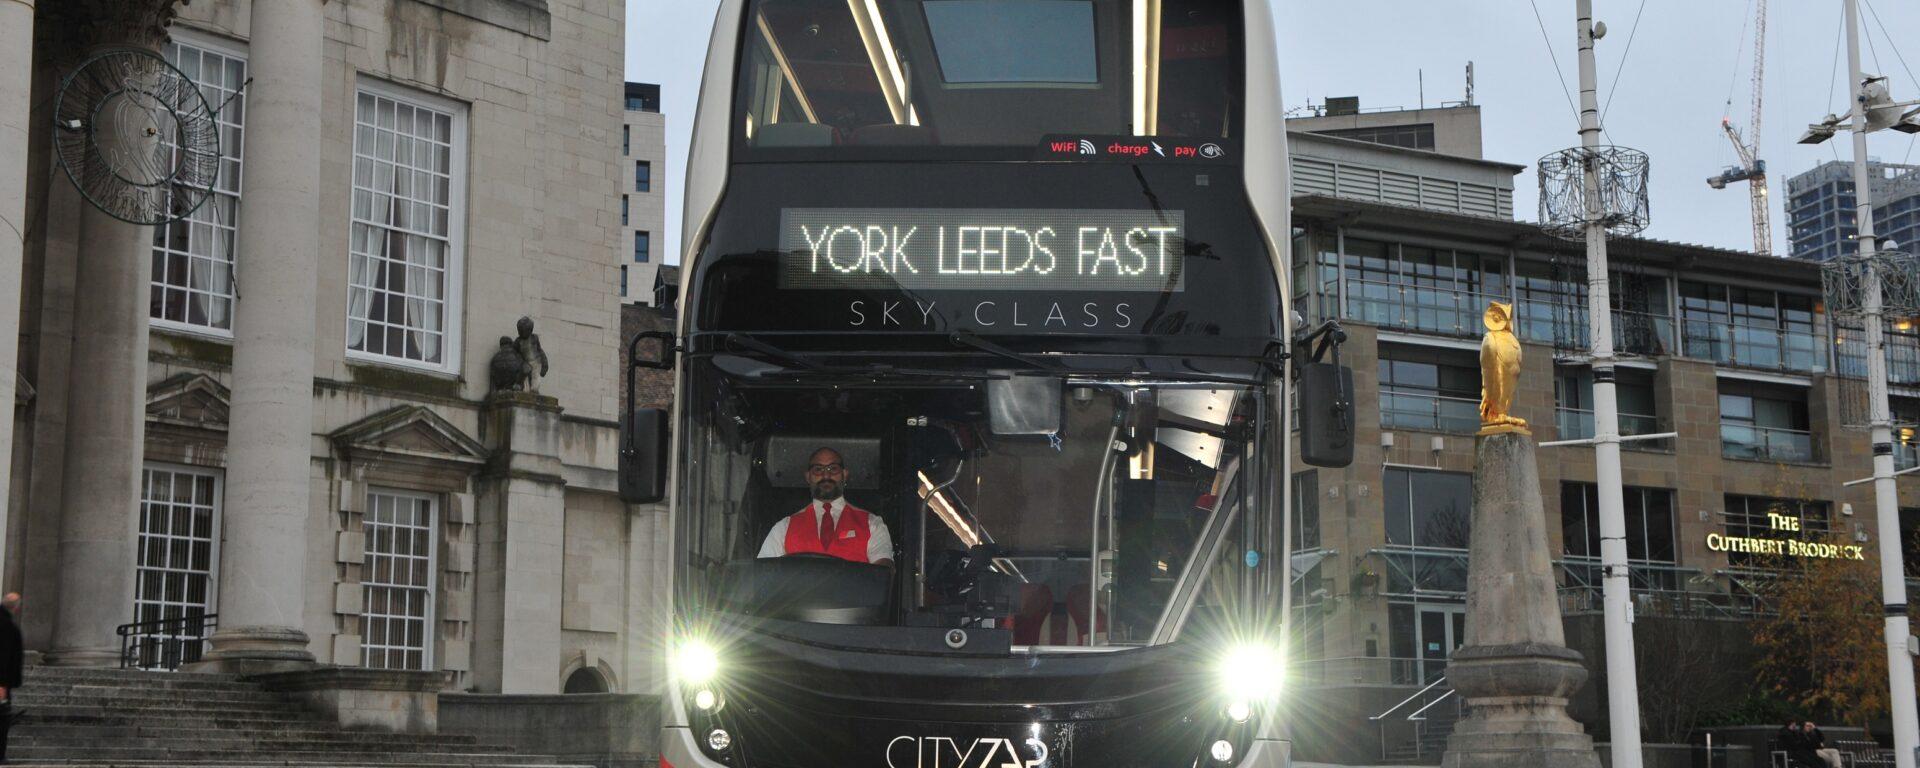 cityzap-bus